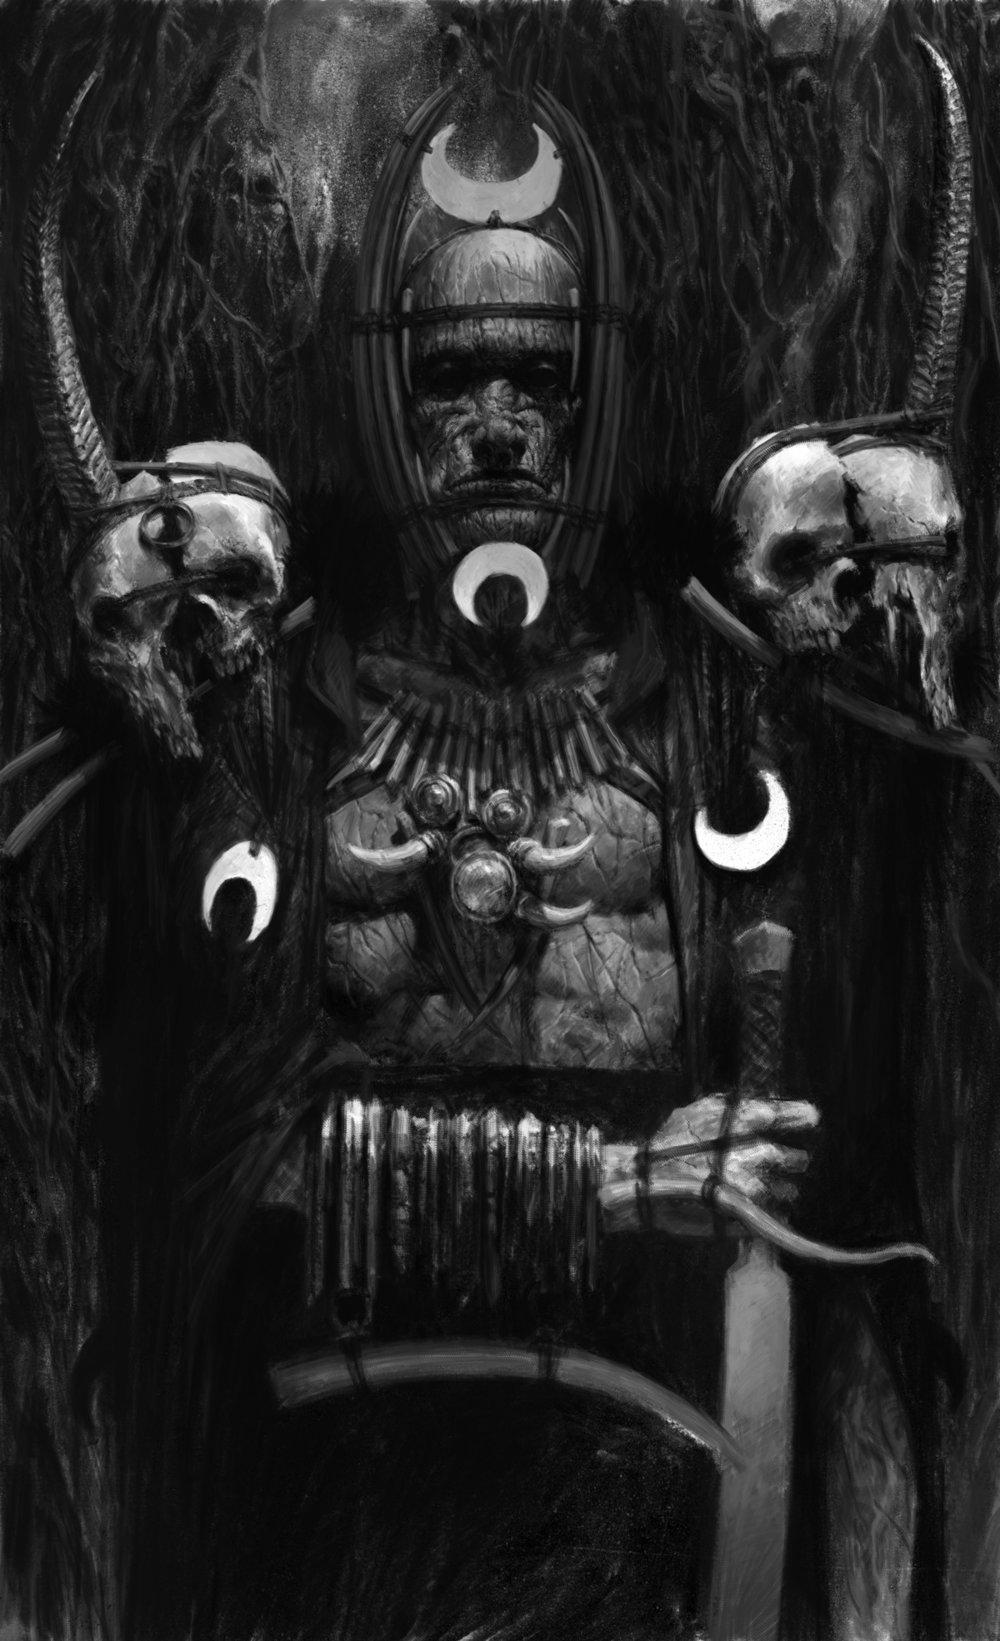 adrian-smith-hate-moonpriest.jpg